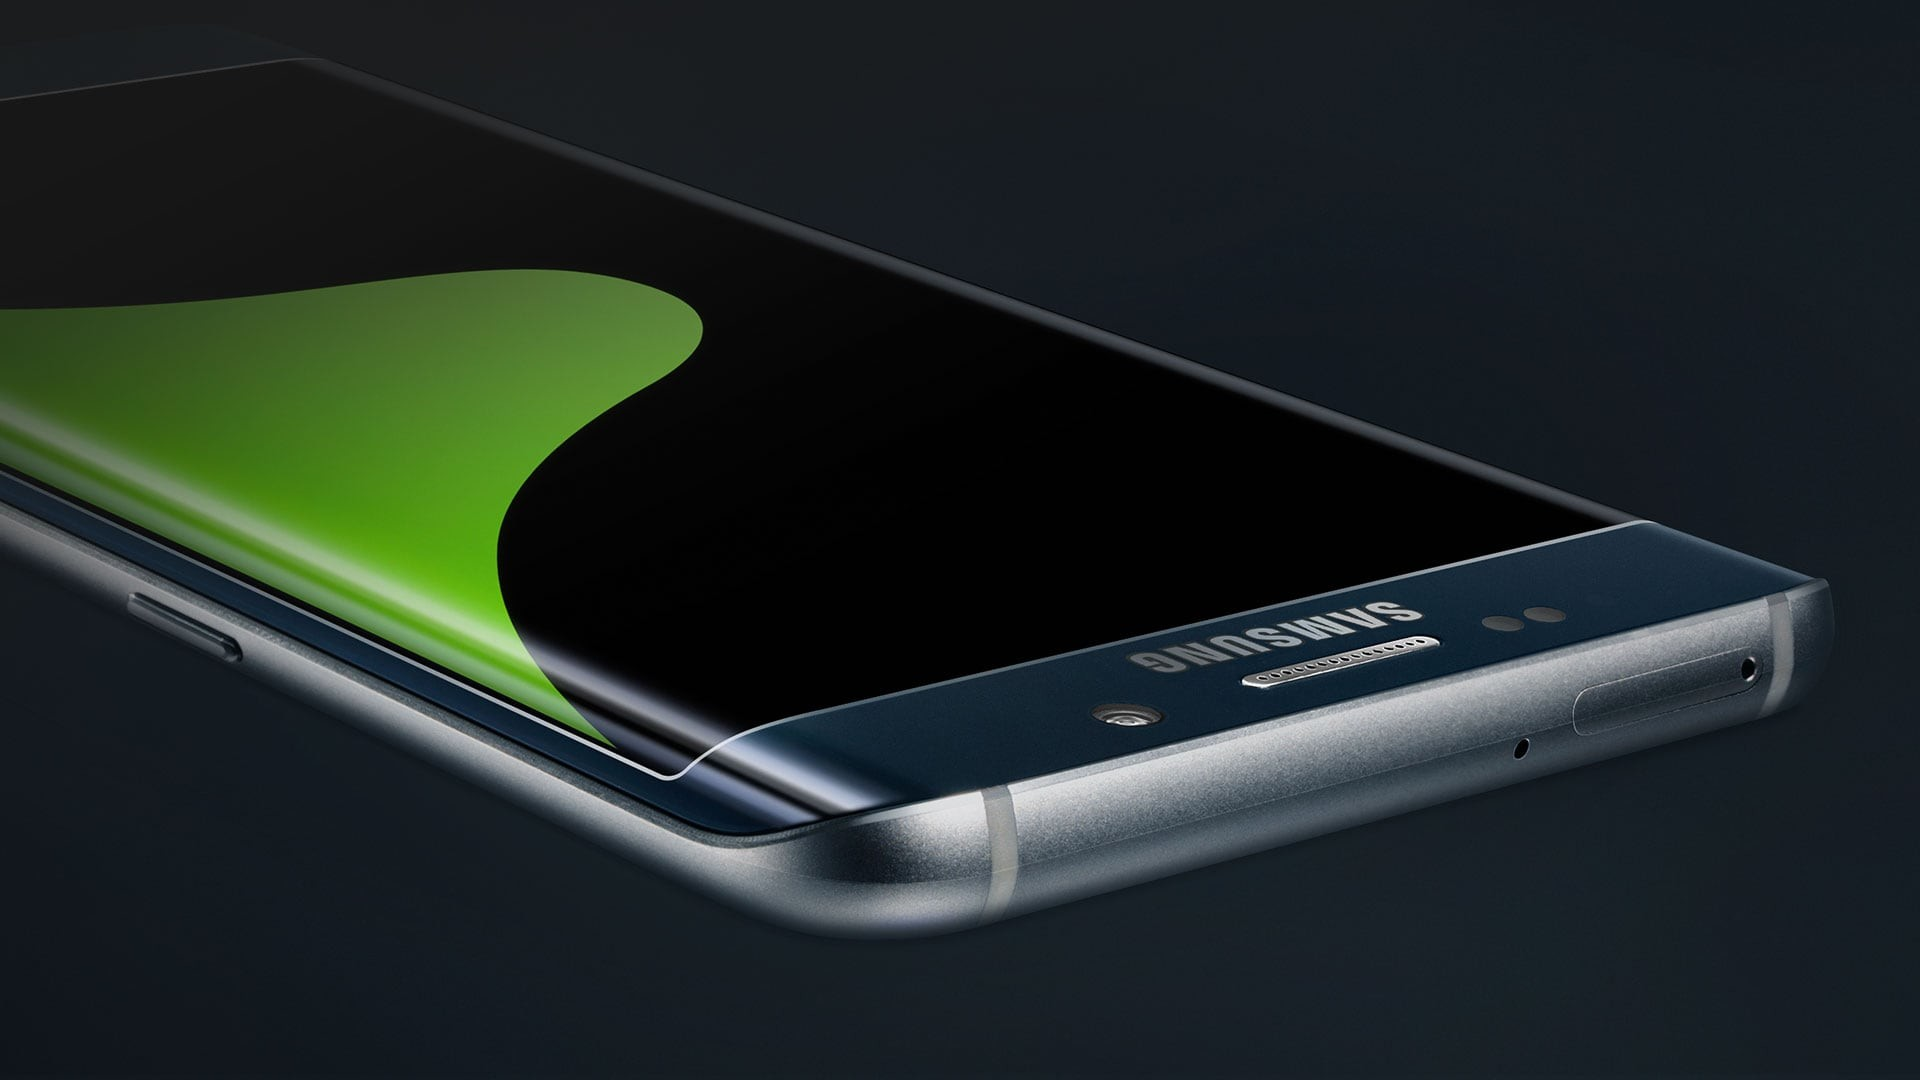 Galaxy S6 Edge Plus Wallpaper 73 Images